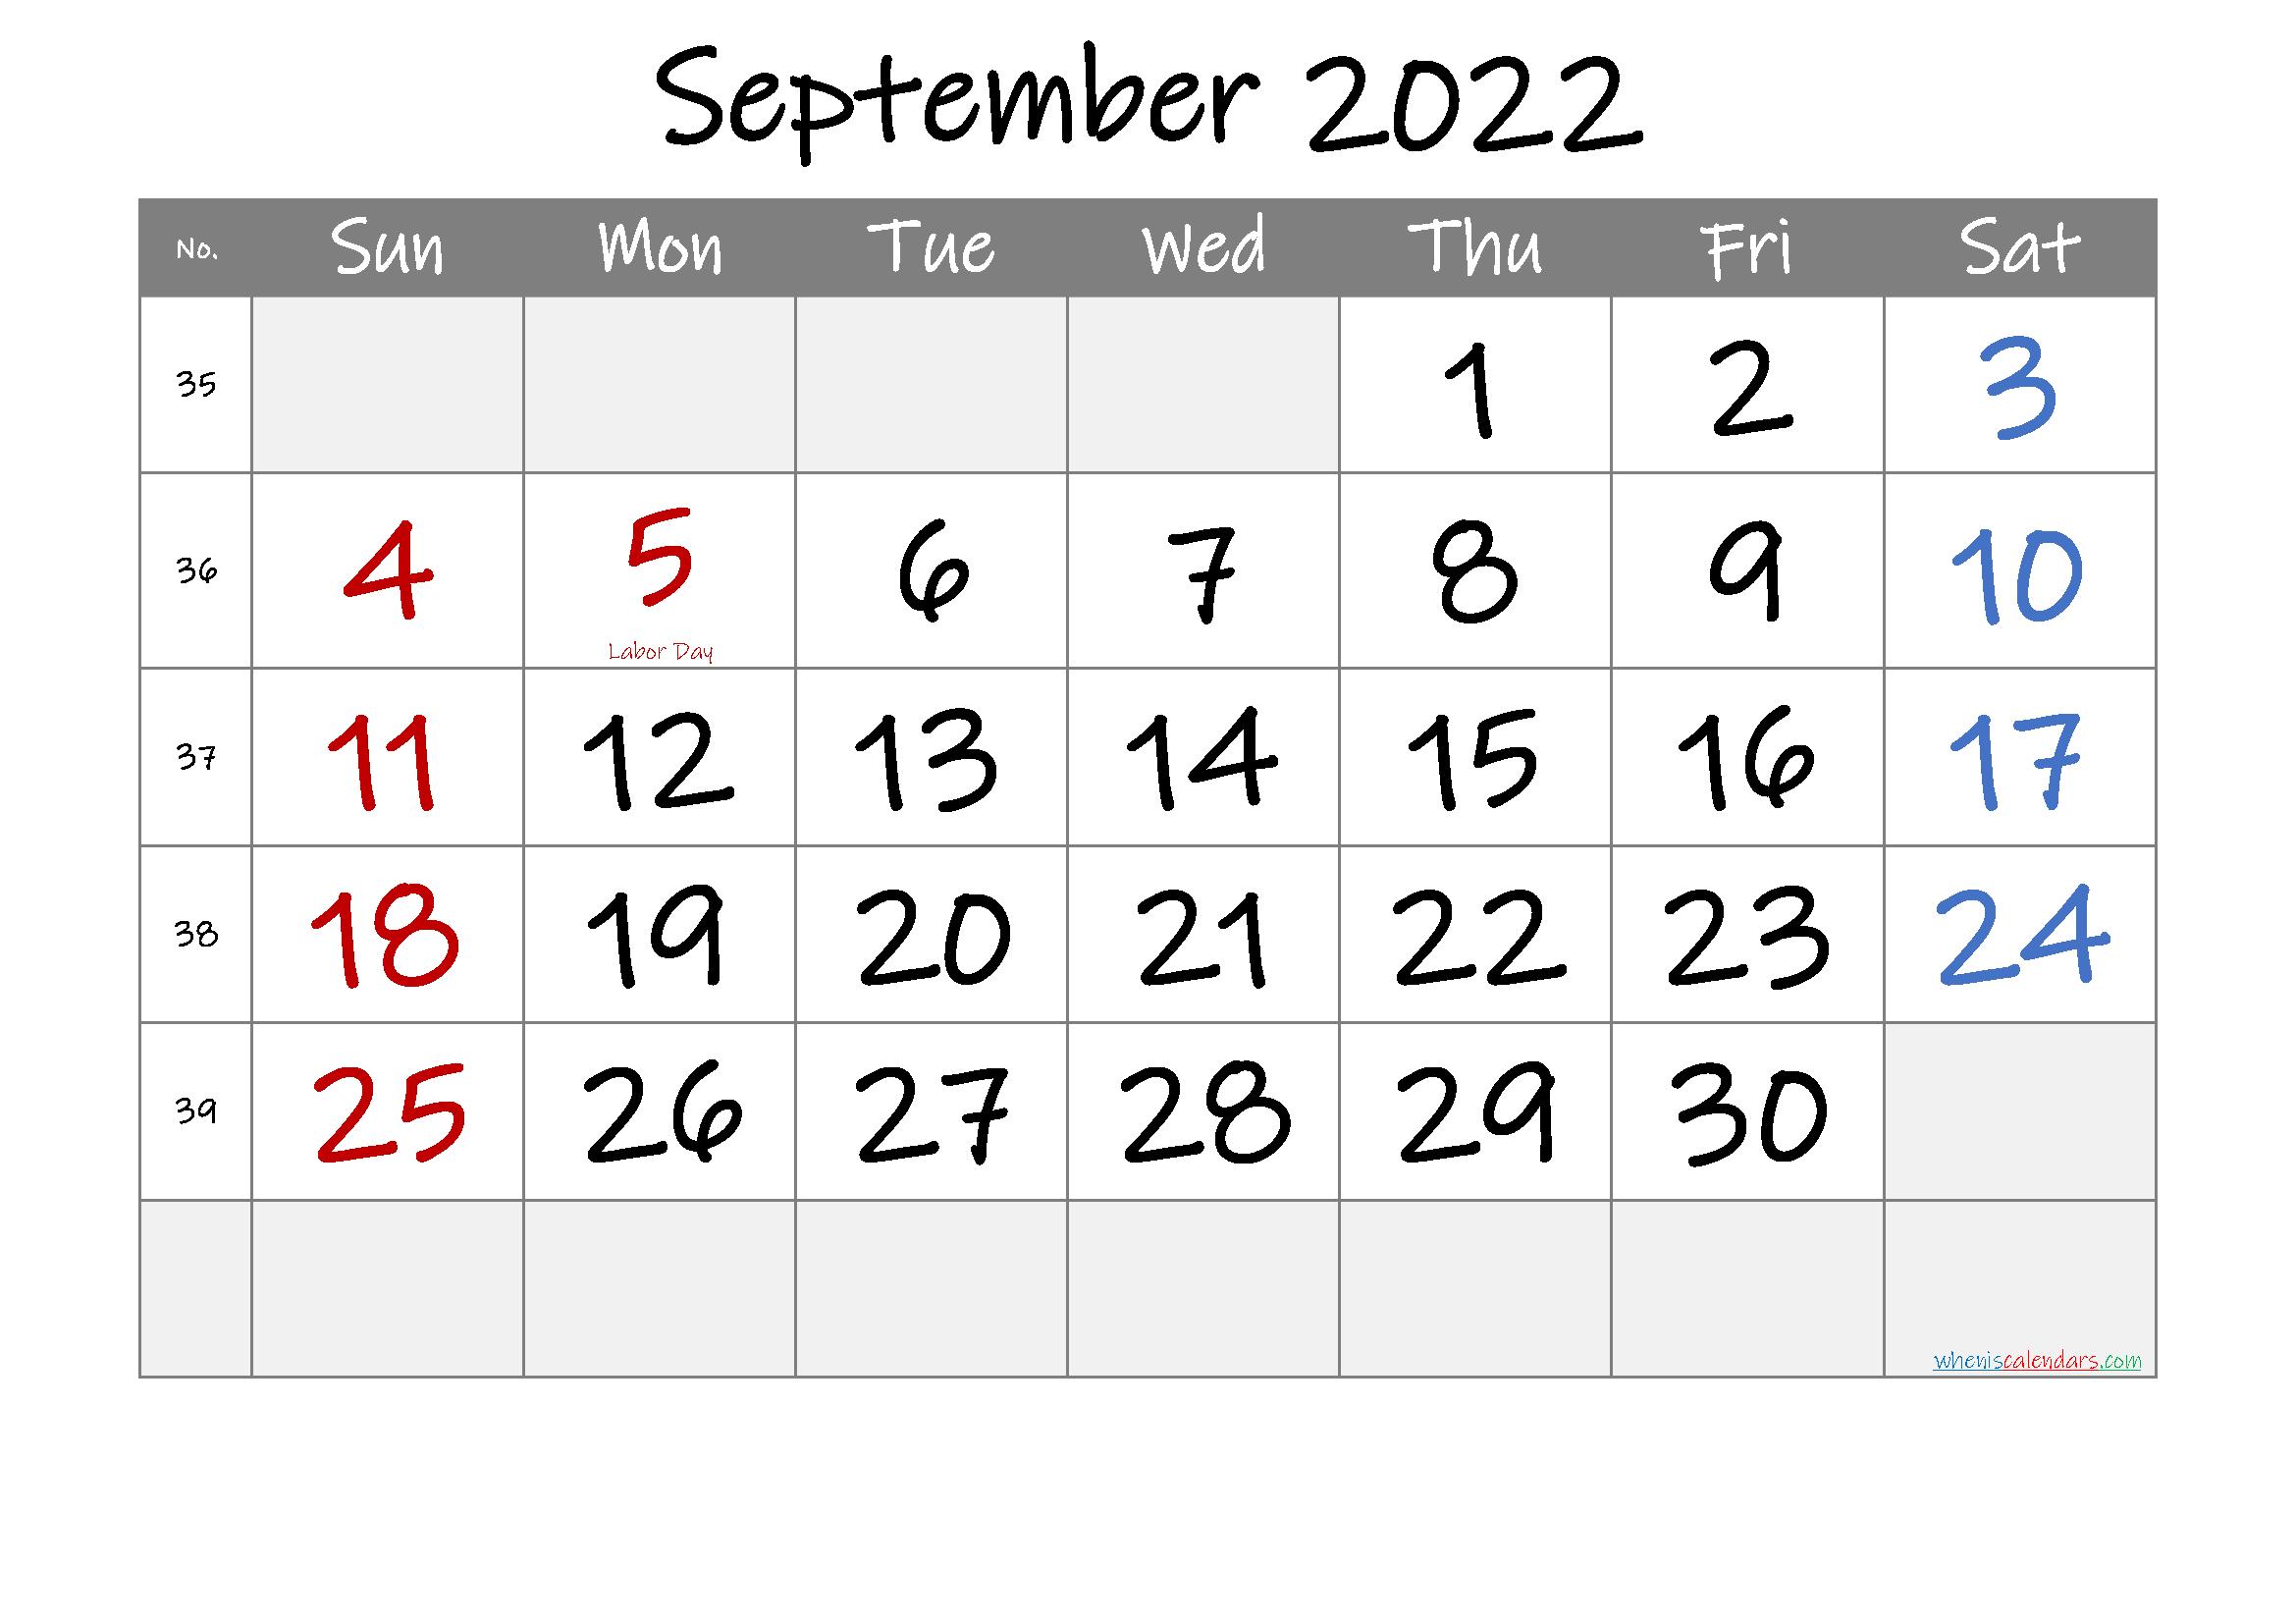 September 2022 Free Printable Calendar-Template No.if22M33